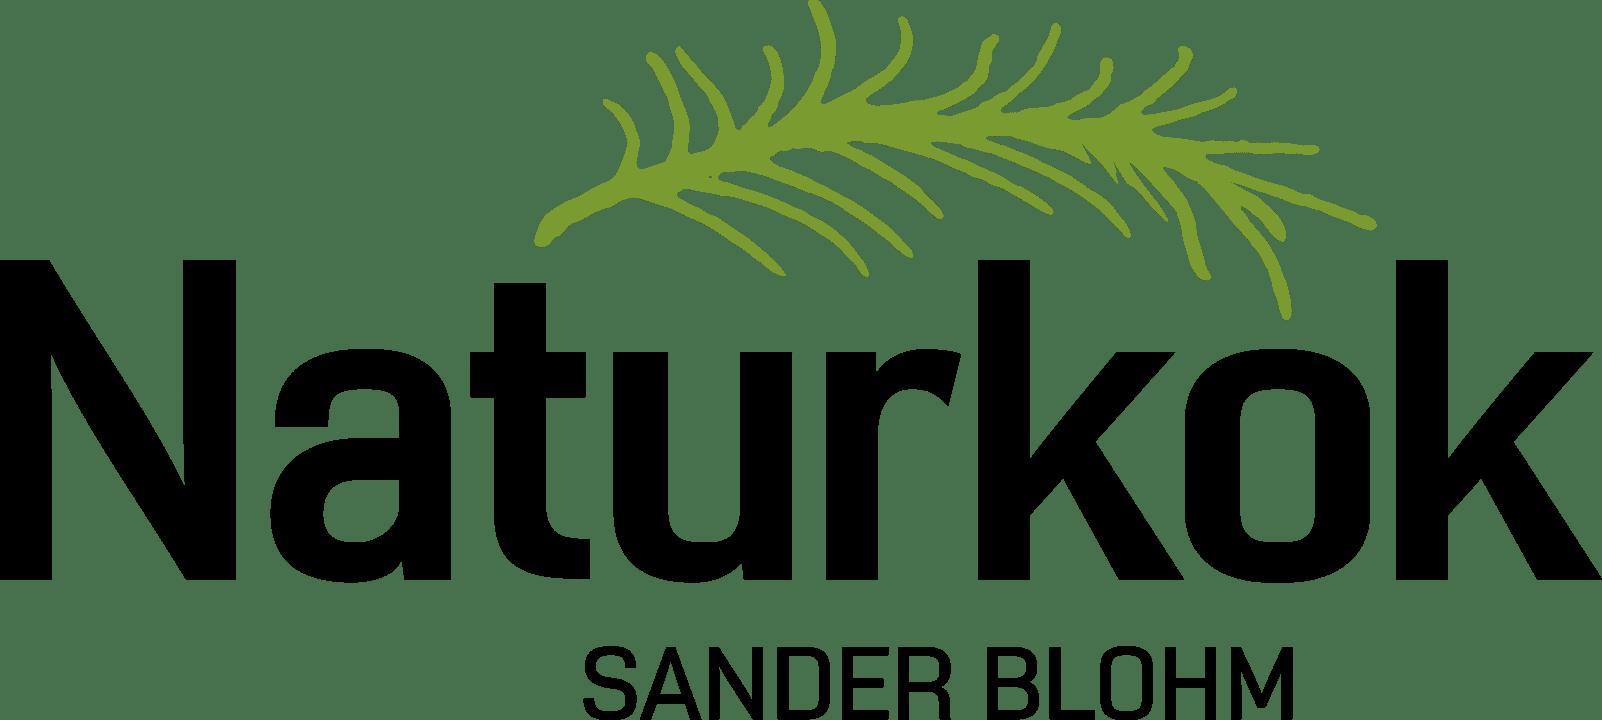 Naturkok Sander Blohm logo